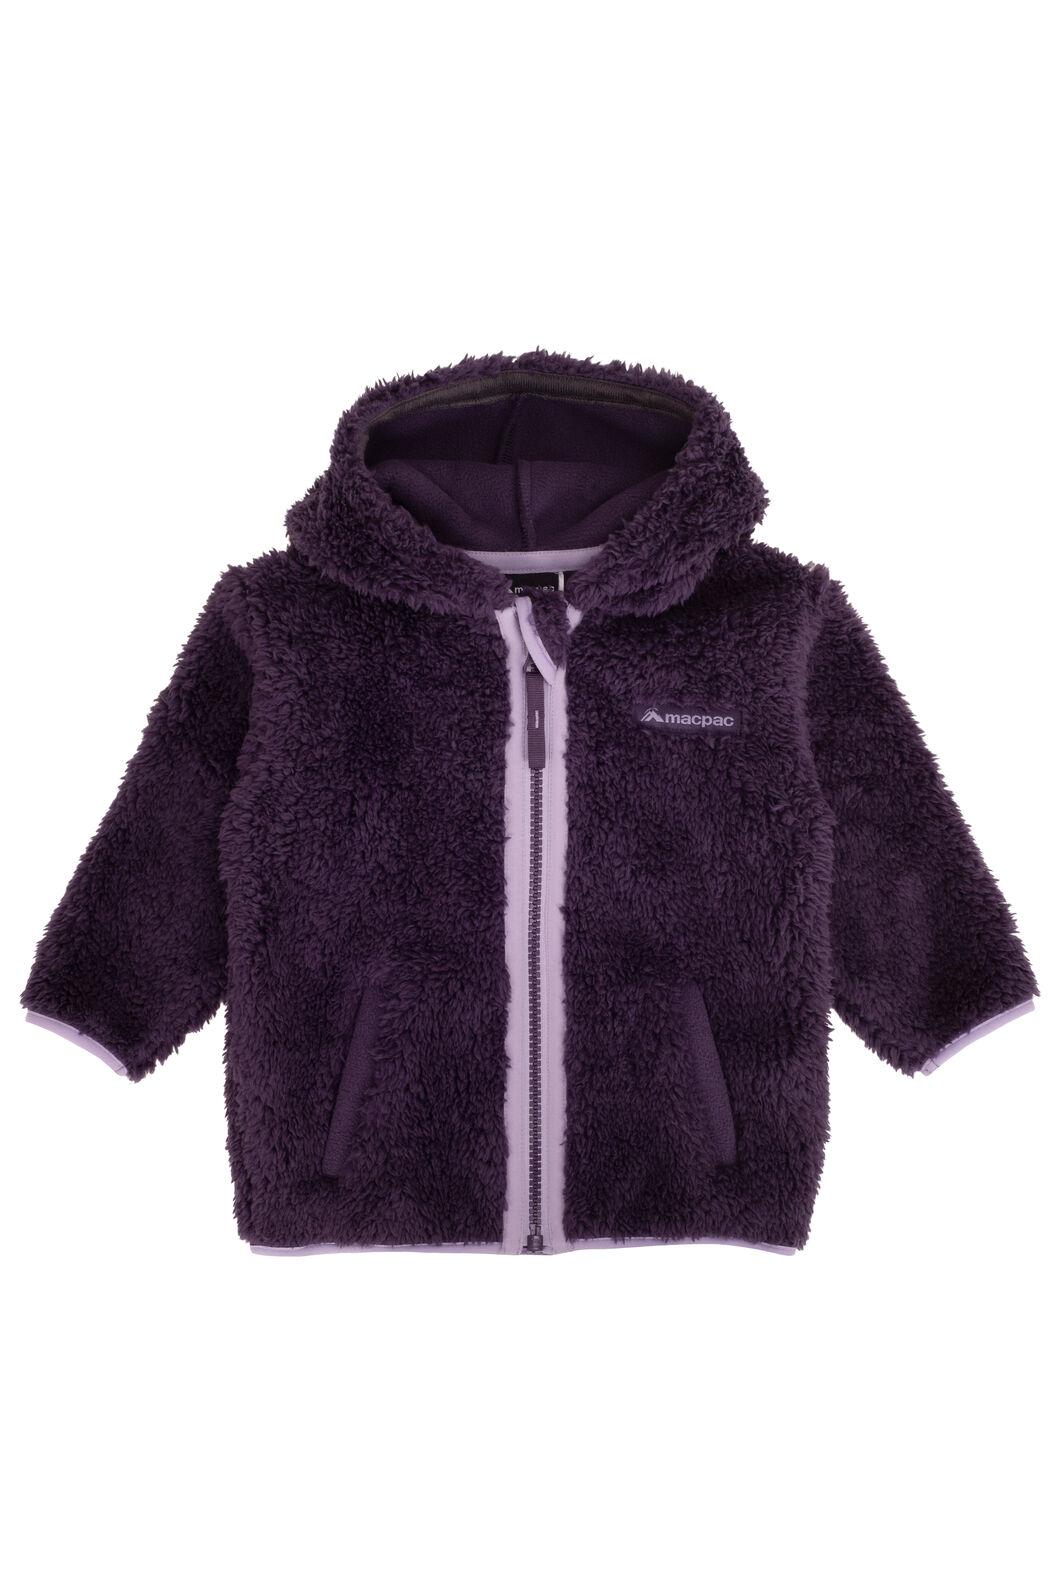 Macpac Baby Acorn Fleece Jacket, Nightshade, hi-res